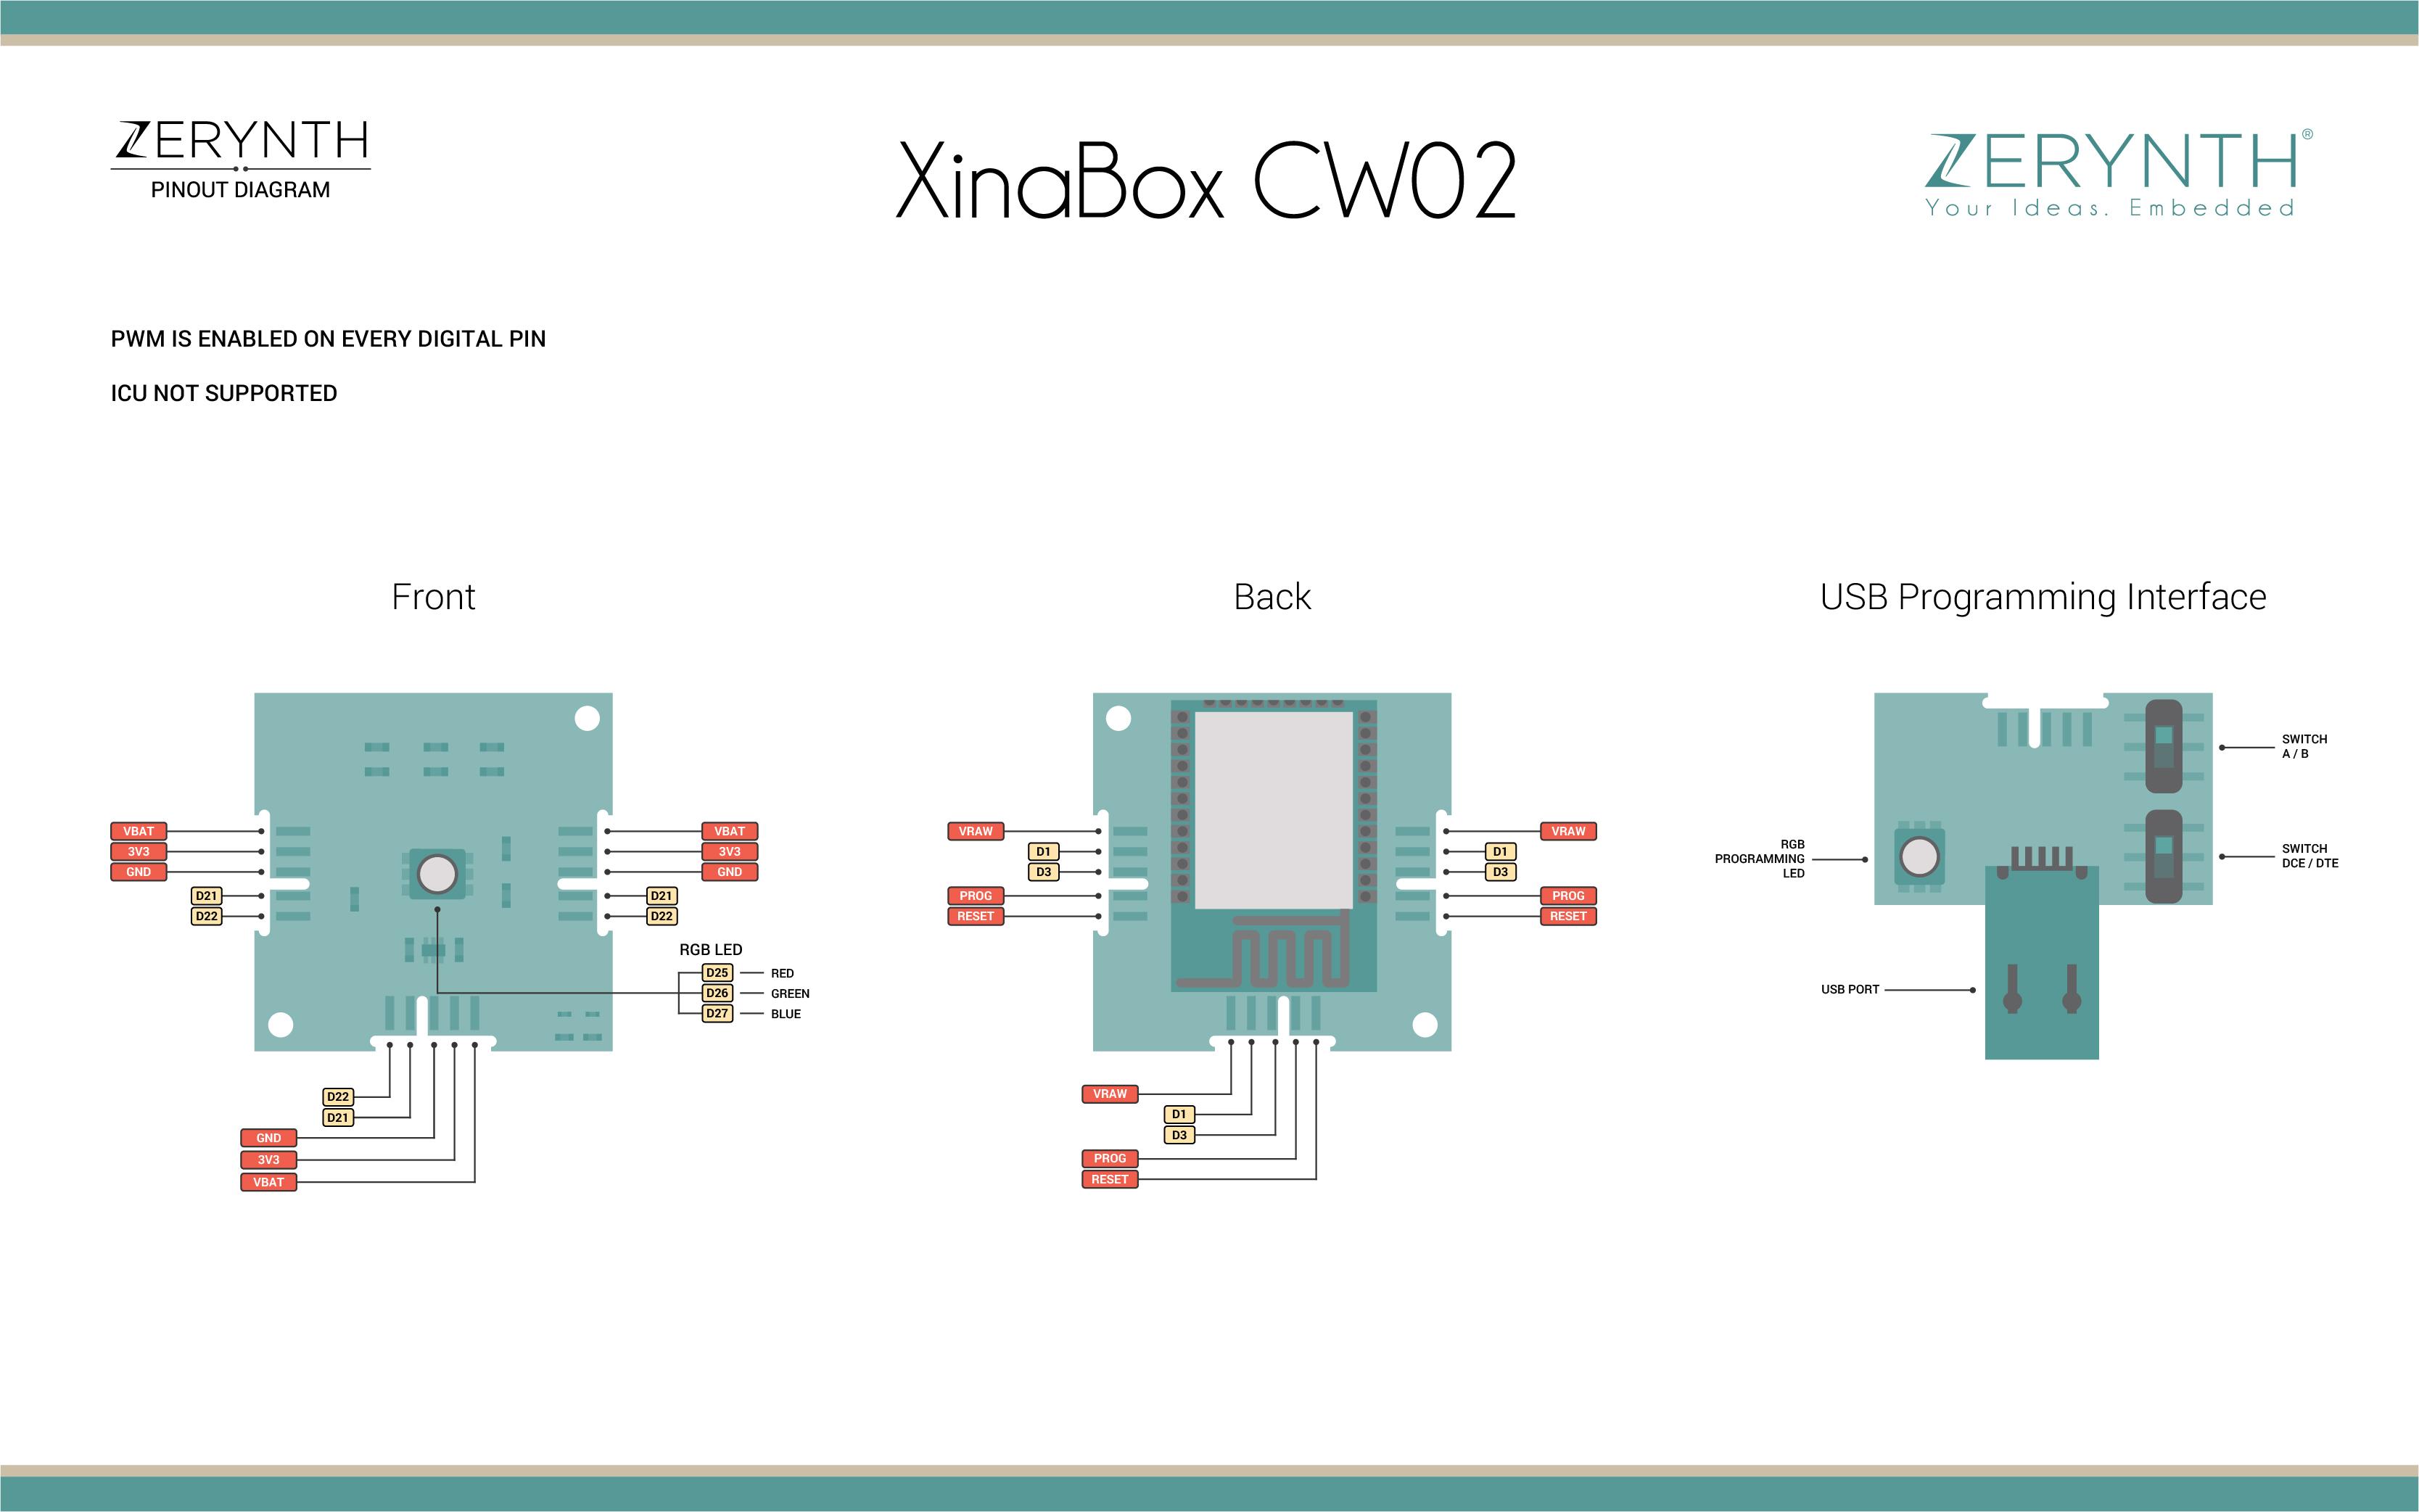 XinaBox CW02 pinout